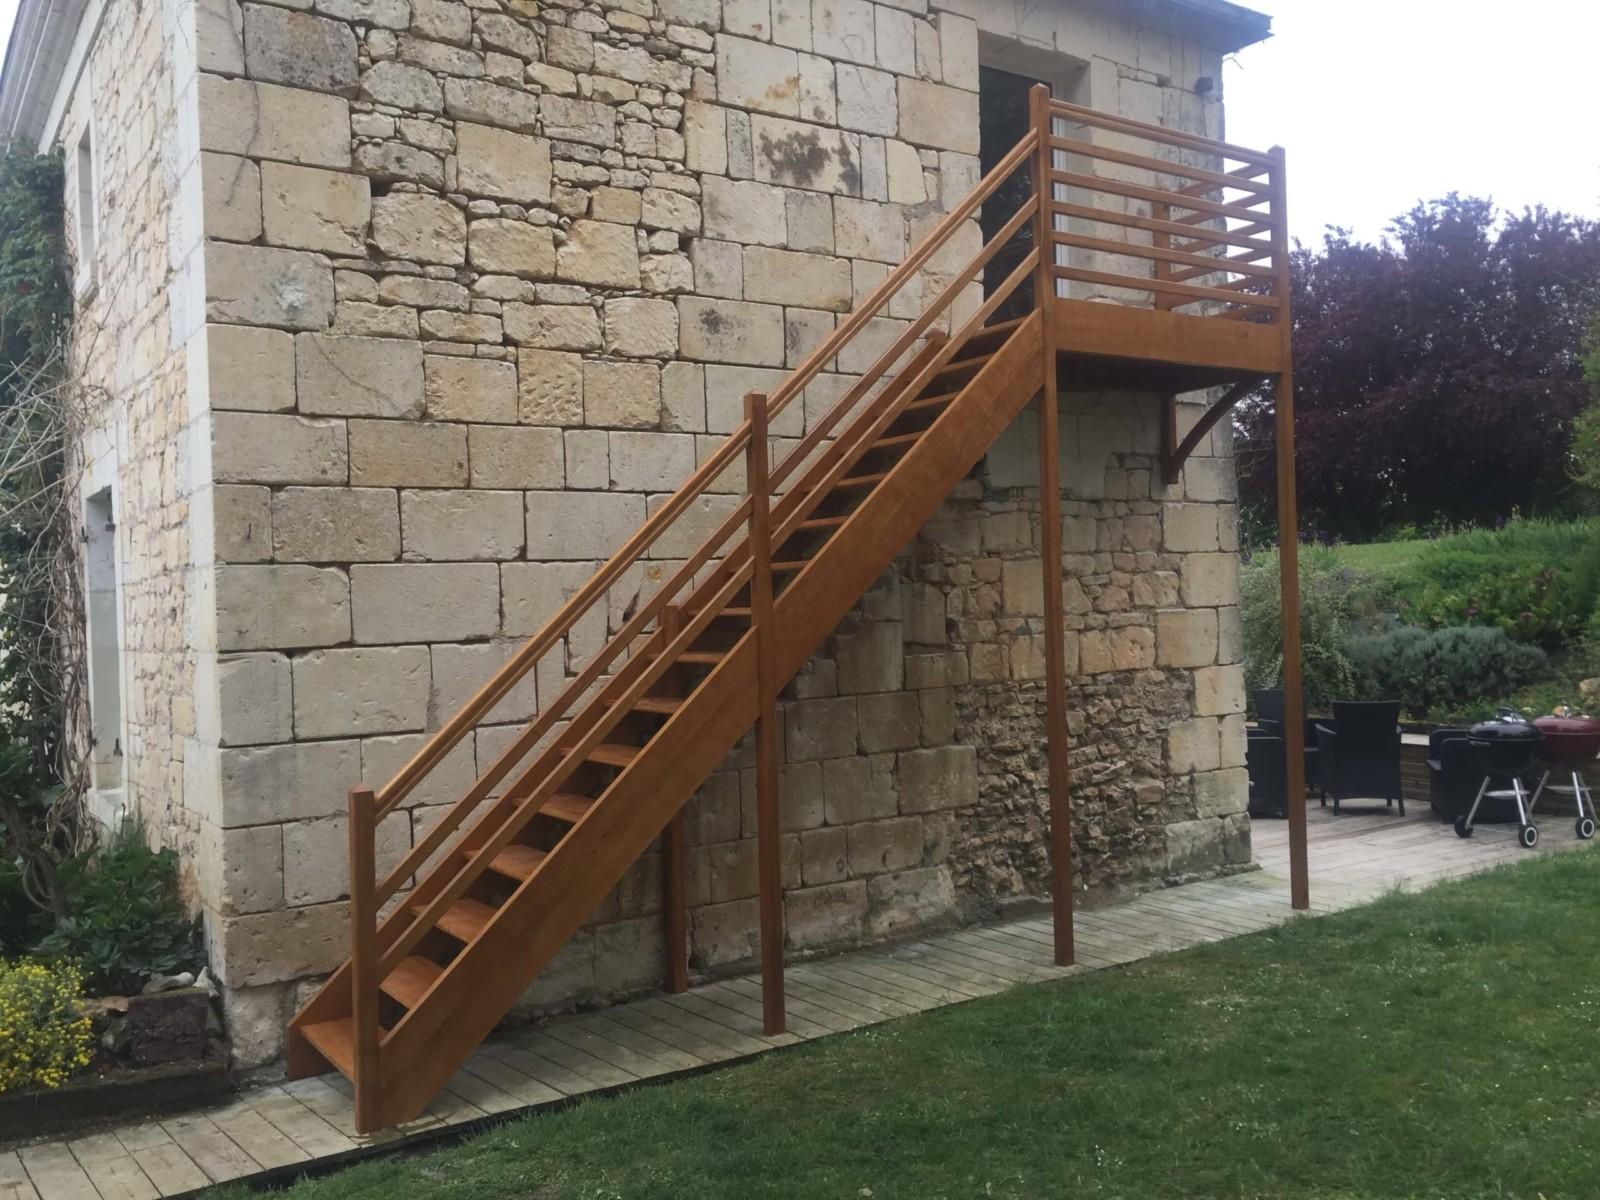 REGIS BERTHELOT Fabricant Escaliers Longue Jumelles IMG 0904 1